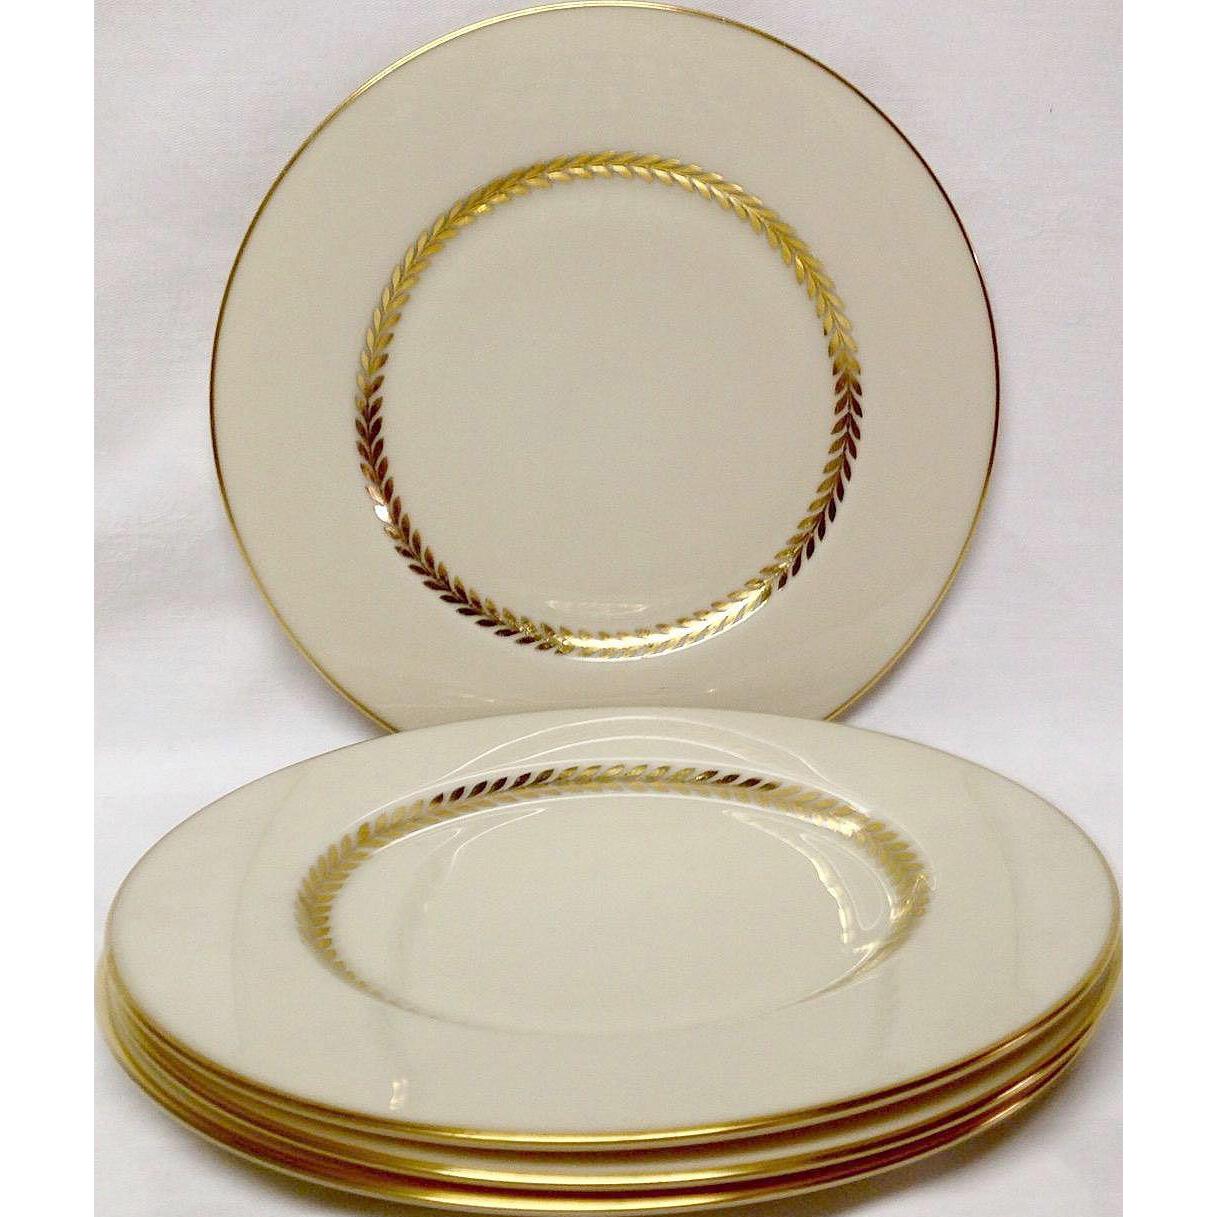 Set (4) Lenox Imperial P338 Bread & Butter Plates